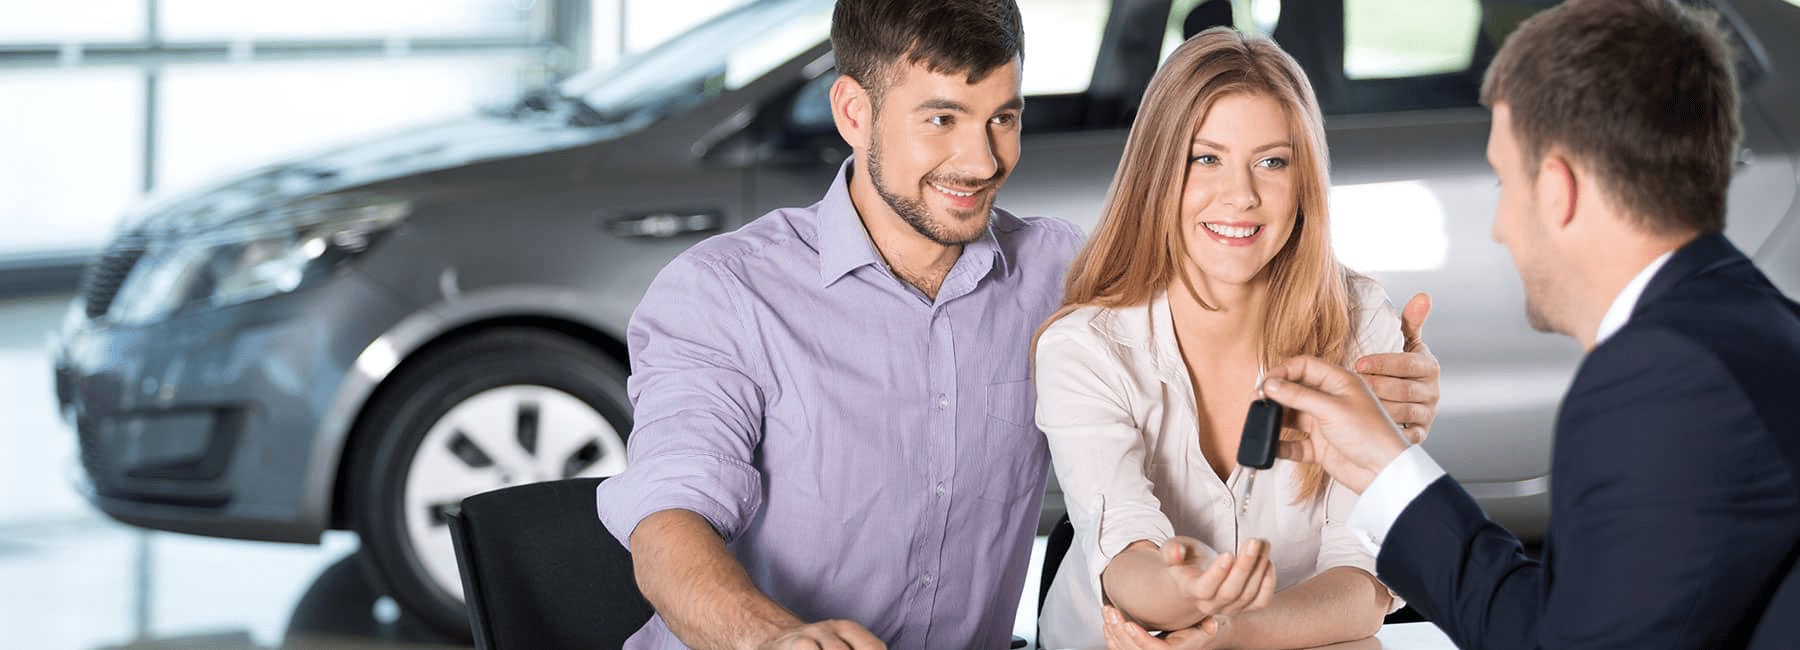 dealer hands new car keys to smiling couple